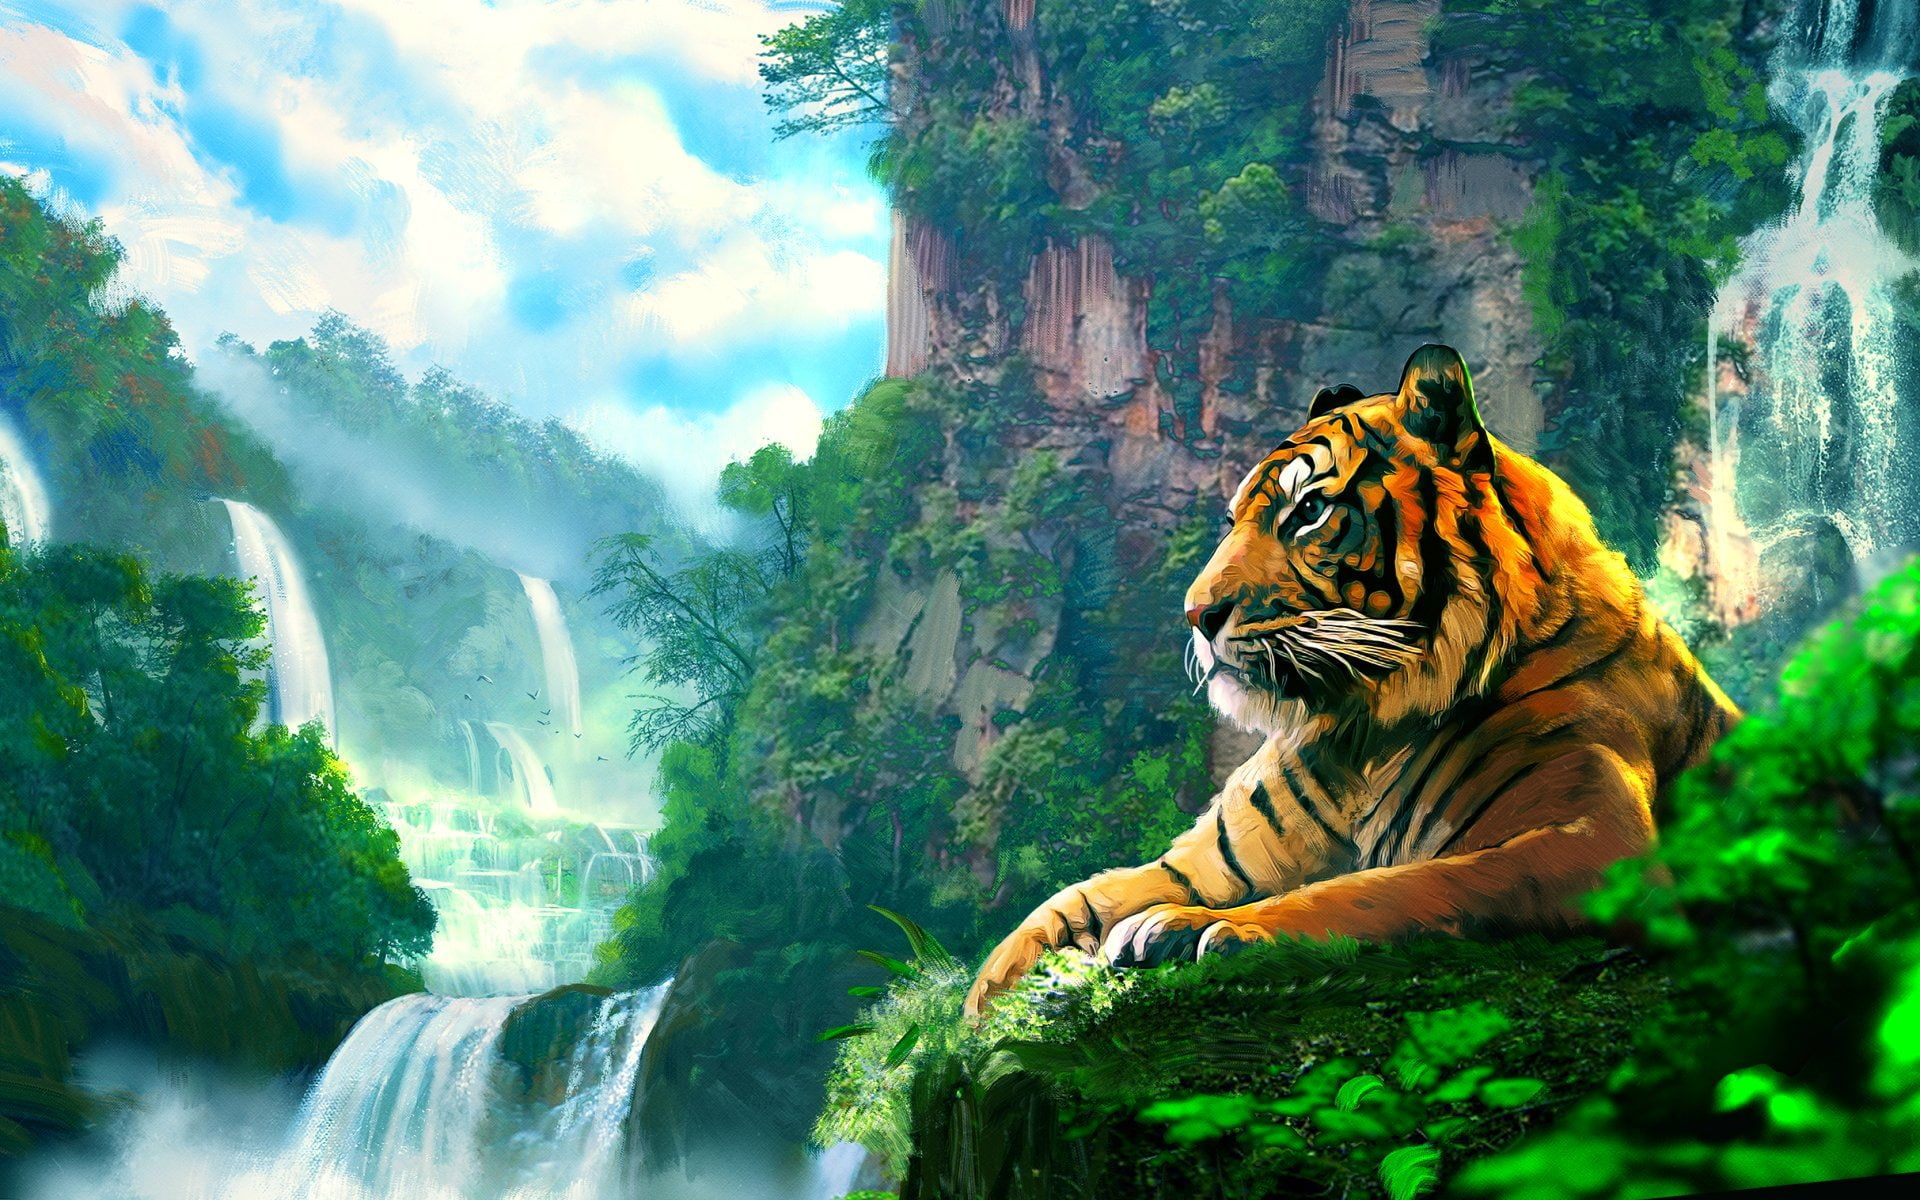 Asian Cat Cats Fantasy Jungle Nature Oriental Predator Tiger 1080p Wallpaper Hdwallpaper Desktop Tiger Wallpaper Animal Wallpaper Tiger Images